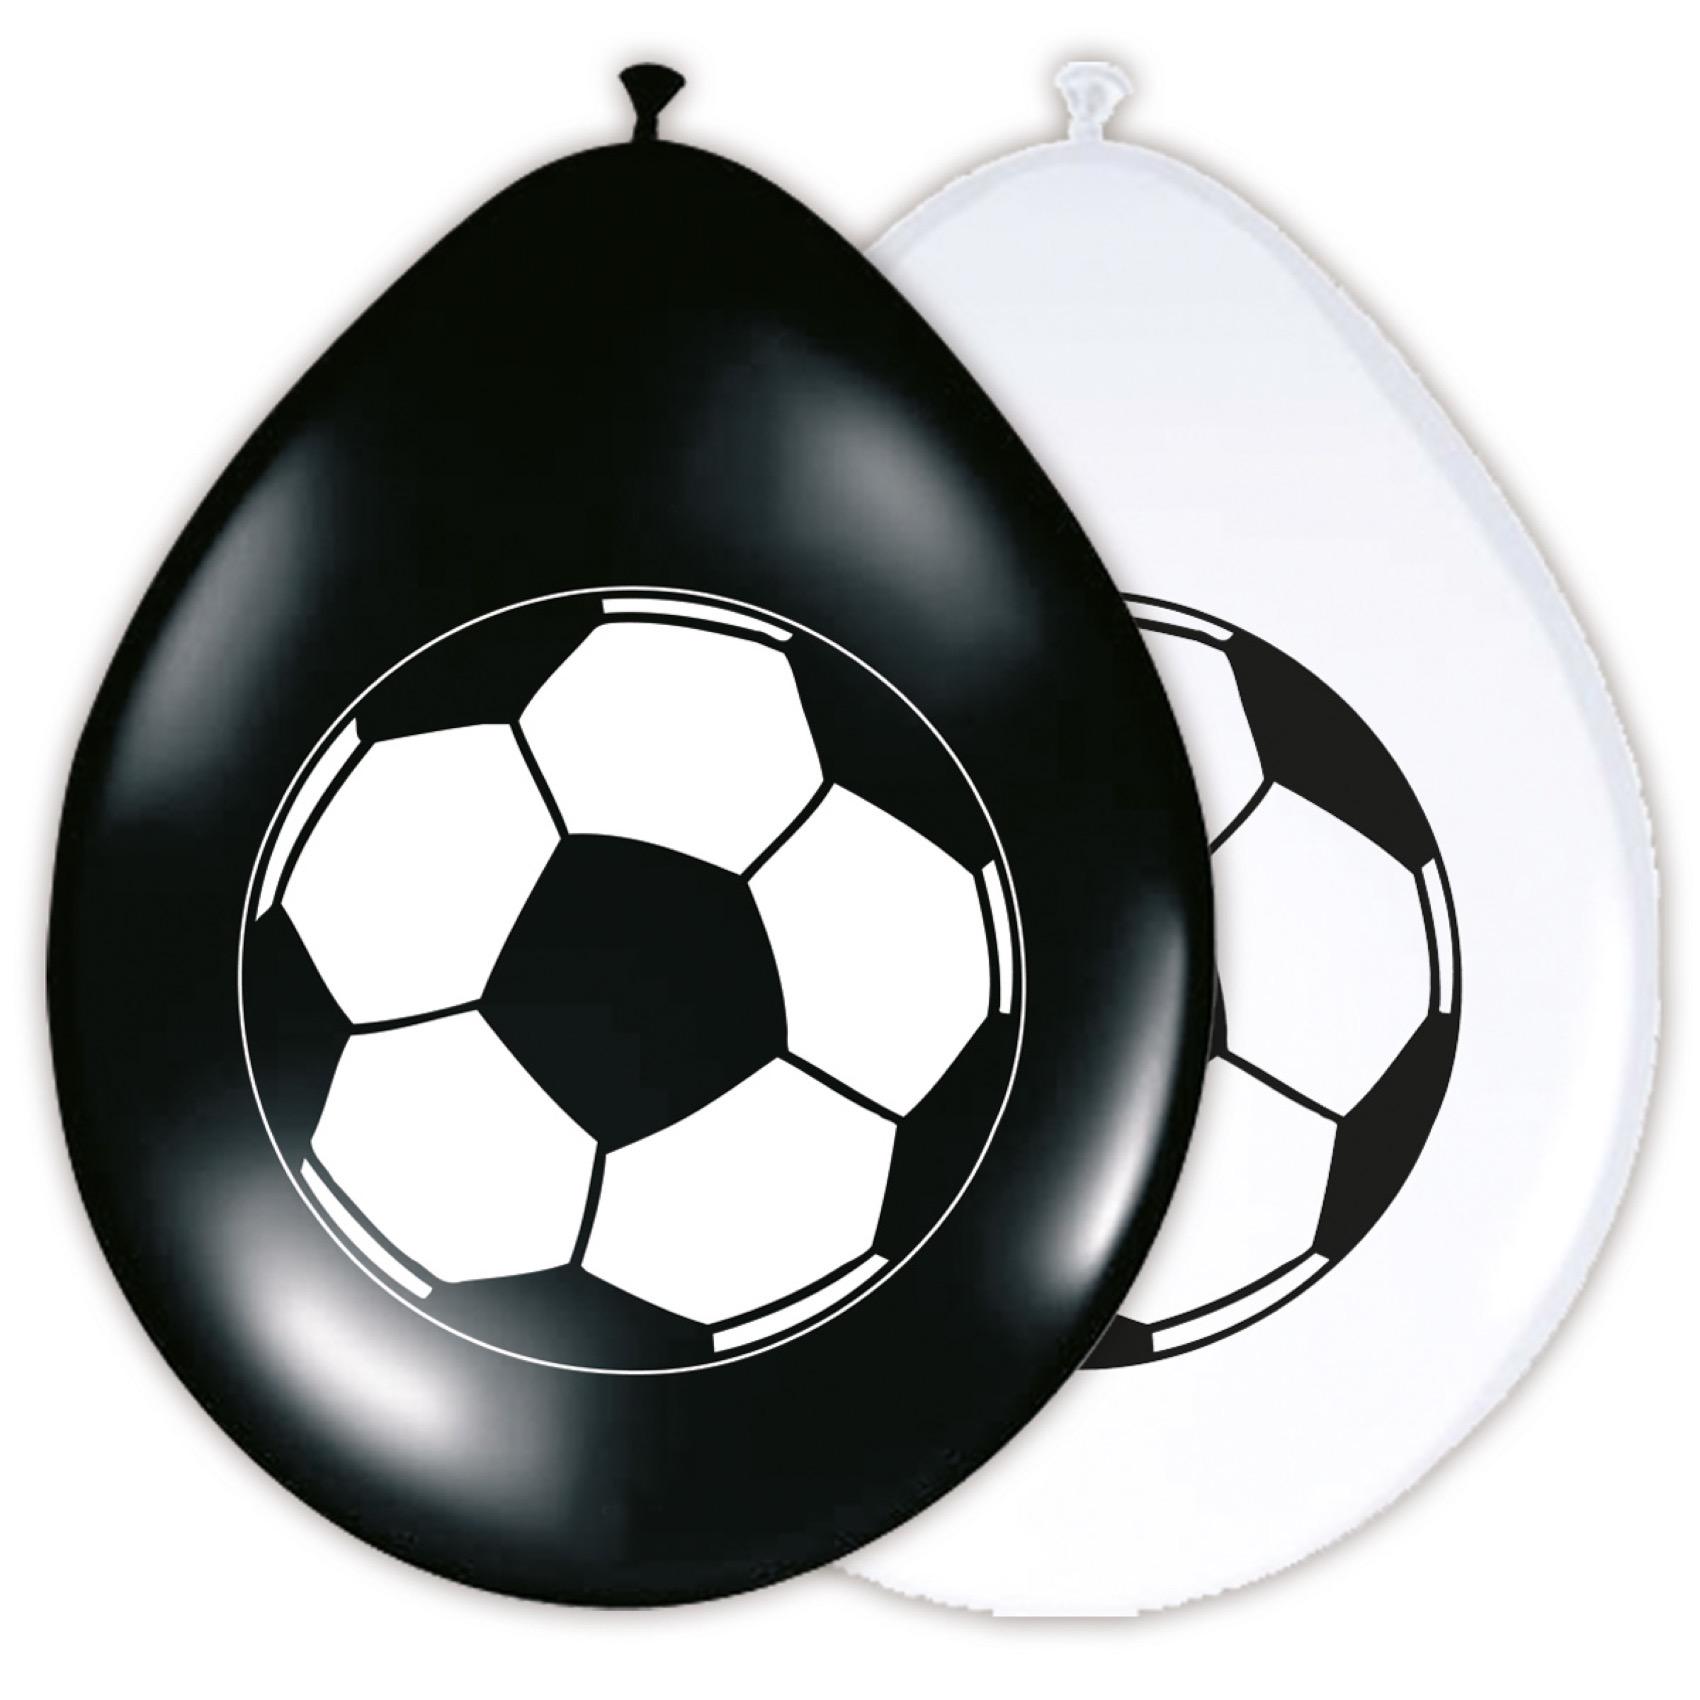 Fußball Pikser 8 Stk. FOLAT 26220 Geburtstag /& Party